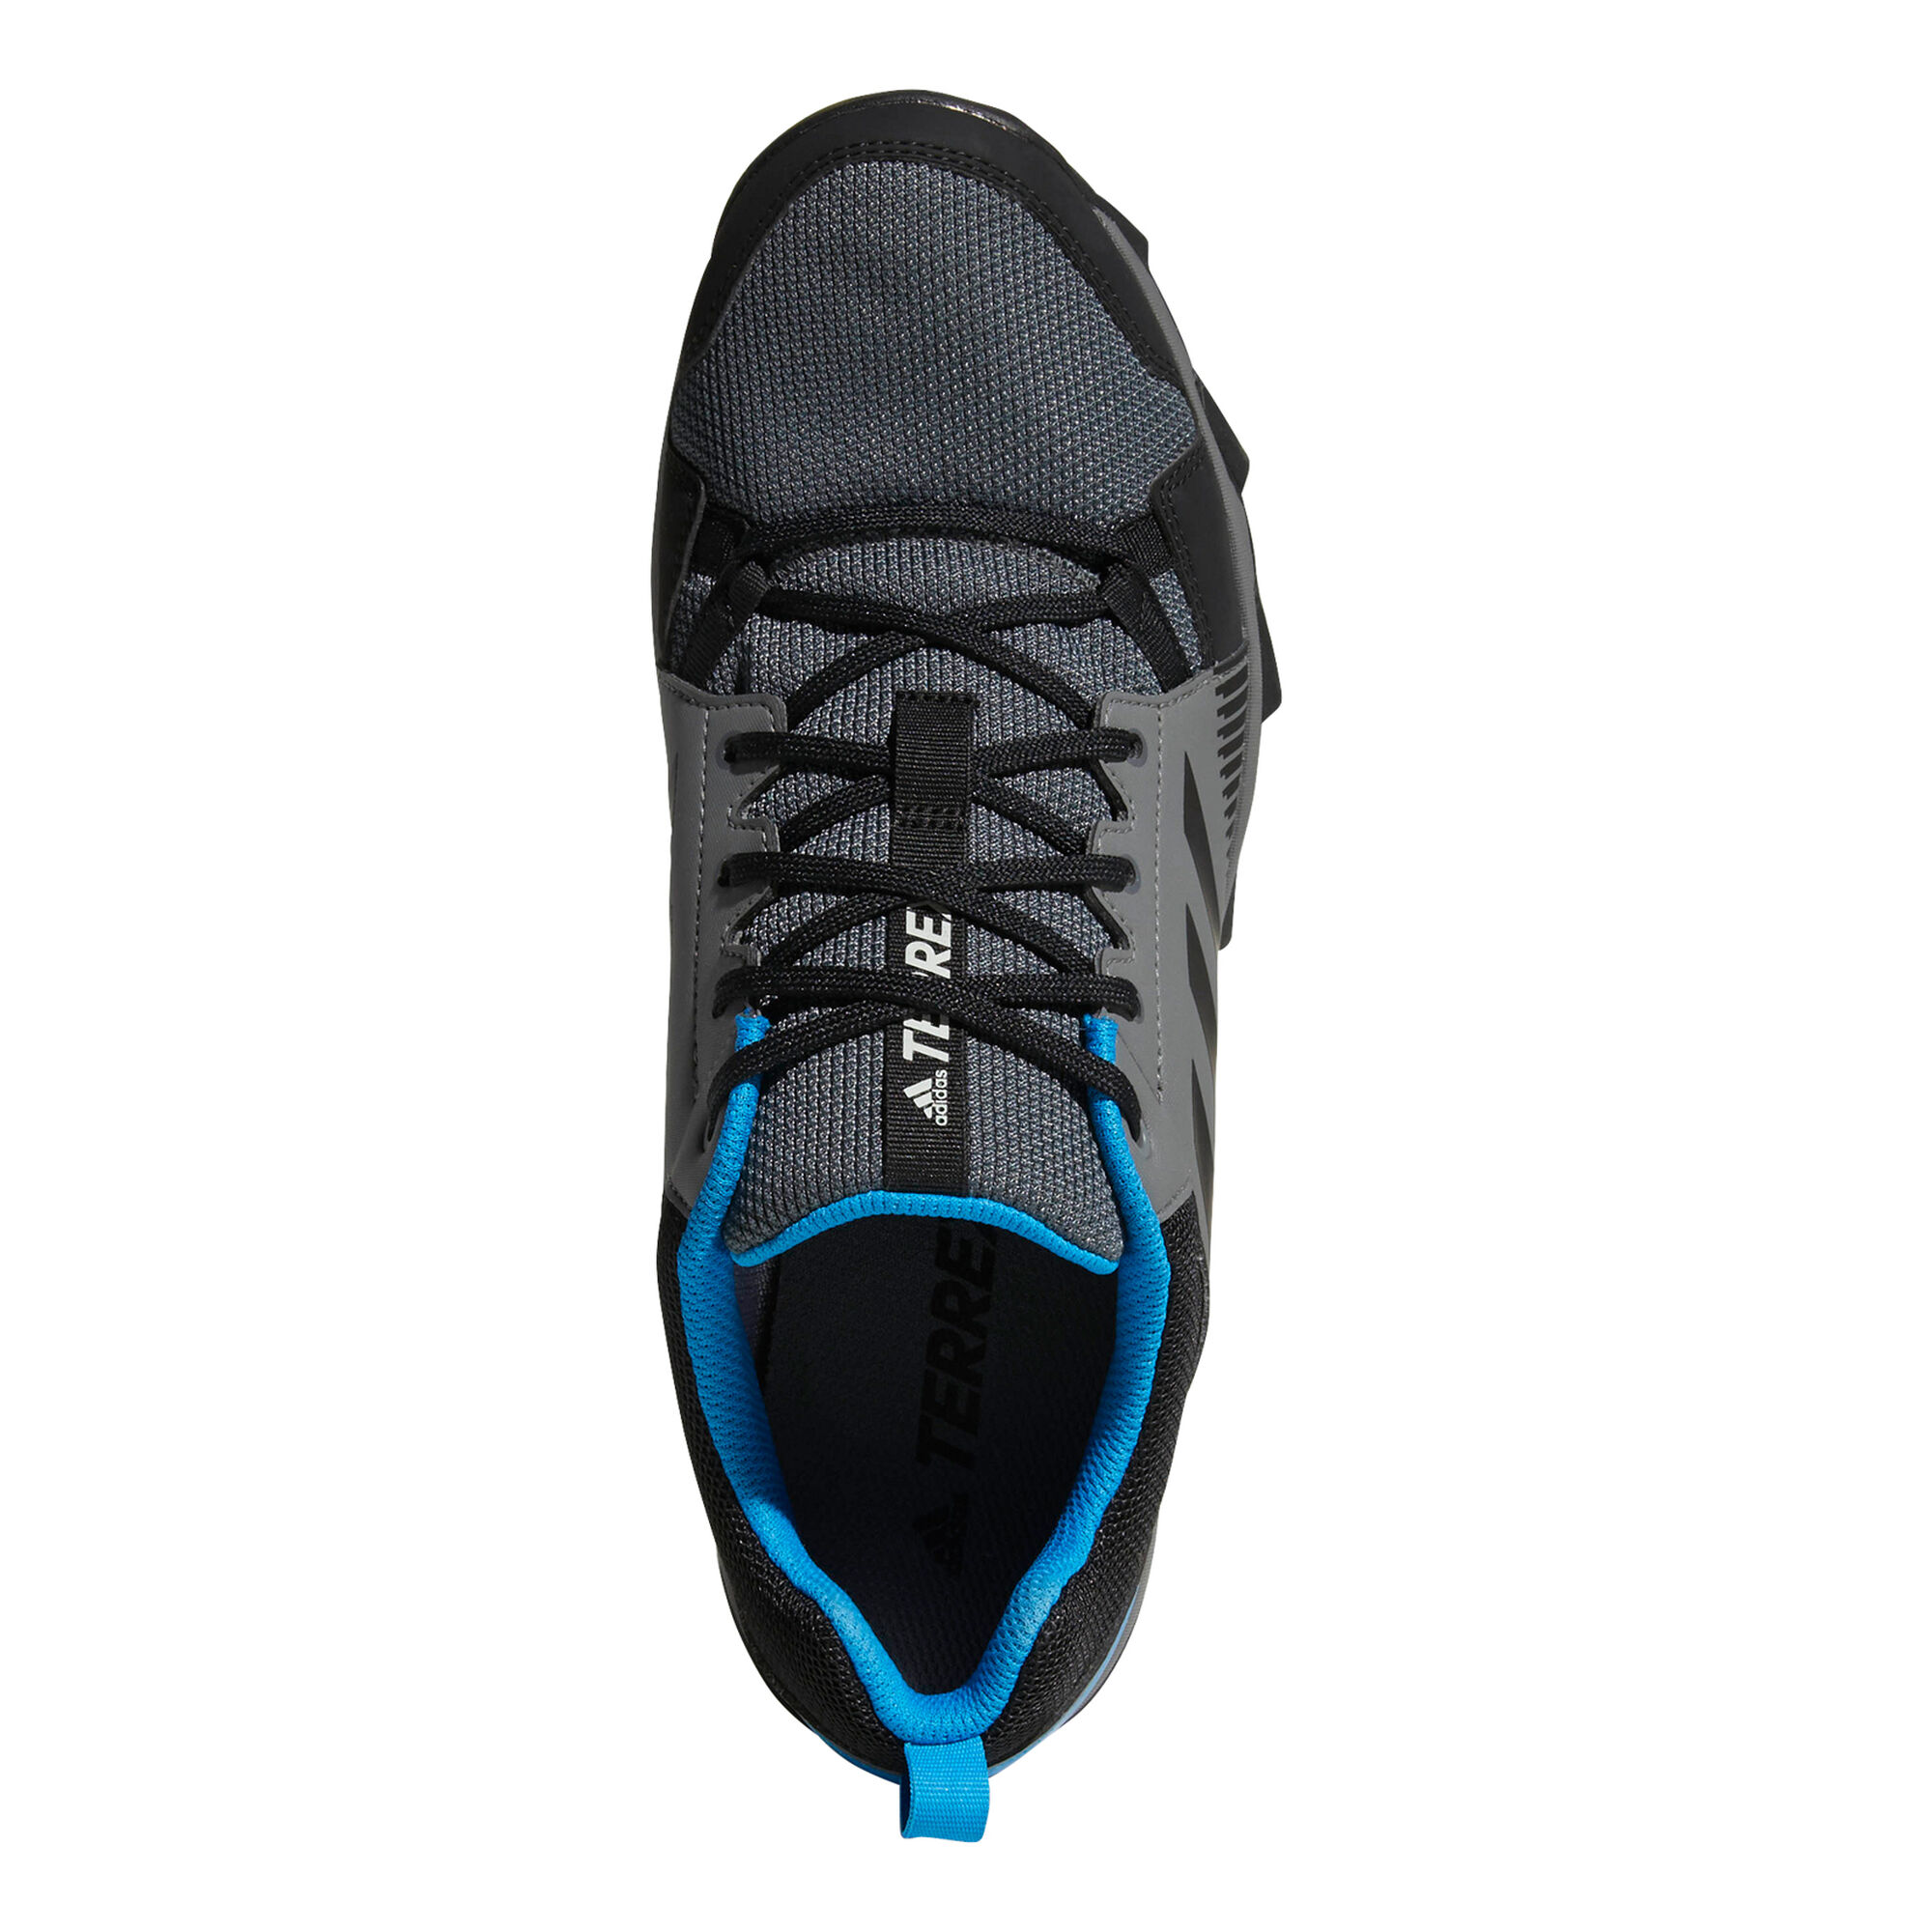 a93d7500faff adidas · adidas · adidas · adidas · adidas · adidas · adidas · adidas ·  adidas. Terrex Tracerocker GTX Men ...